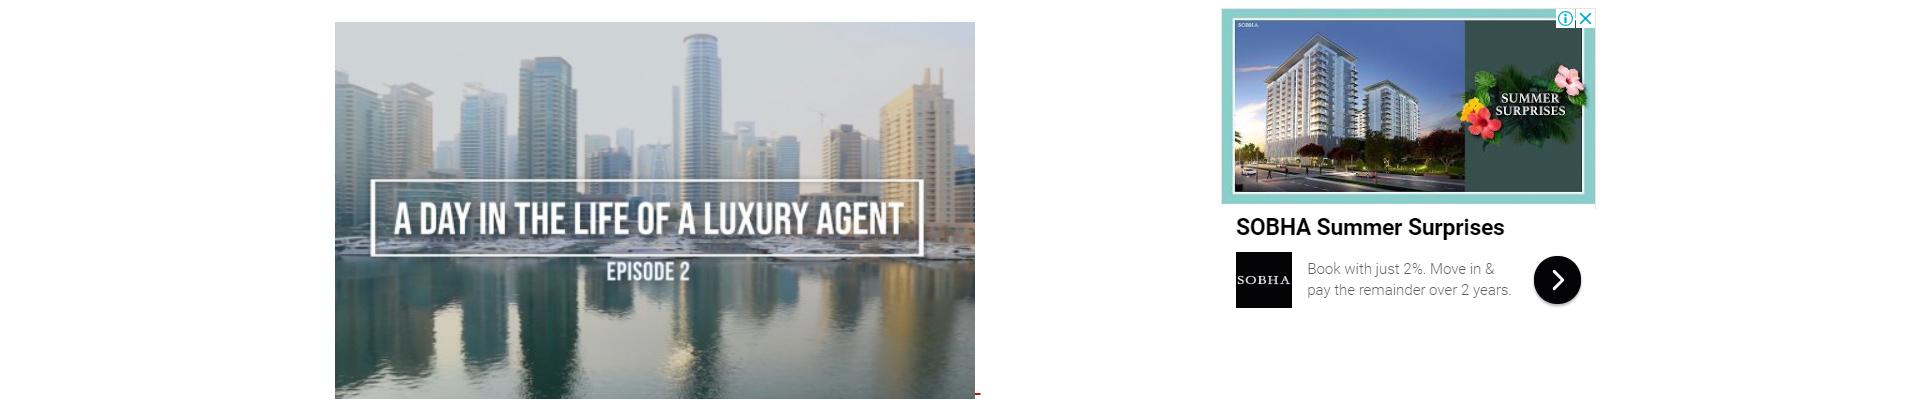 Digital Journal - Dubai's Newest Real Estate Show 2